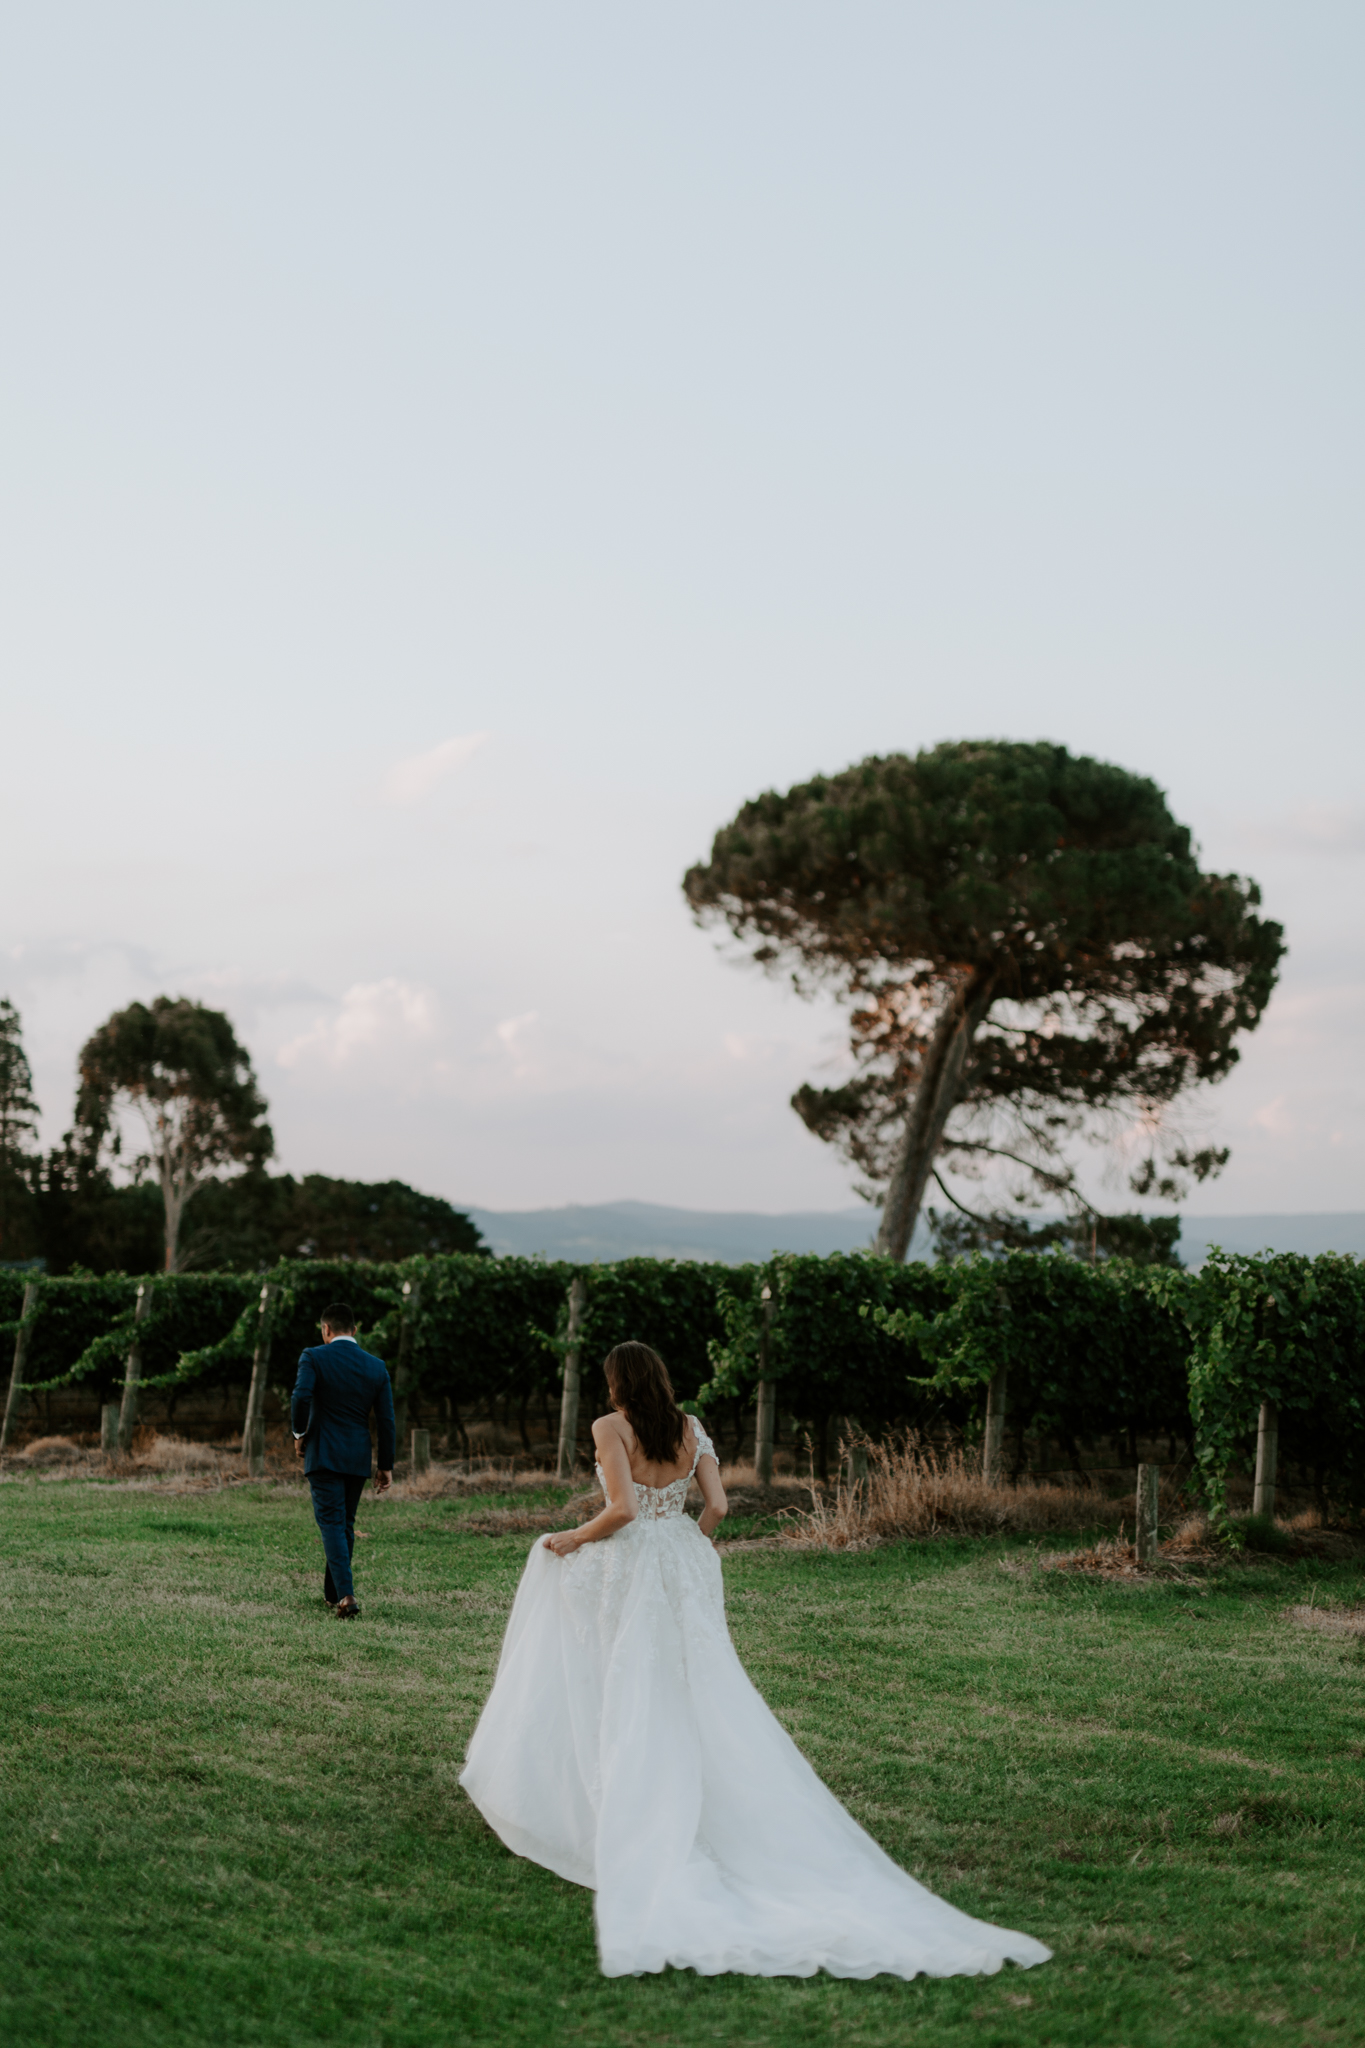 The-Stones-of-Yarra-Valley-Wedding-EmotionsandMathPhotography-226.jpg